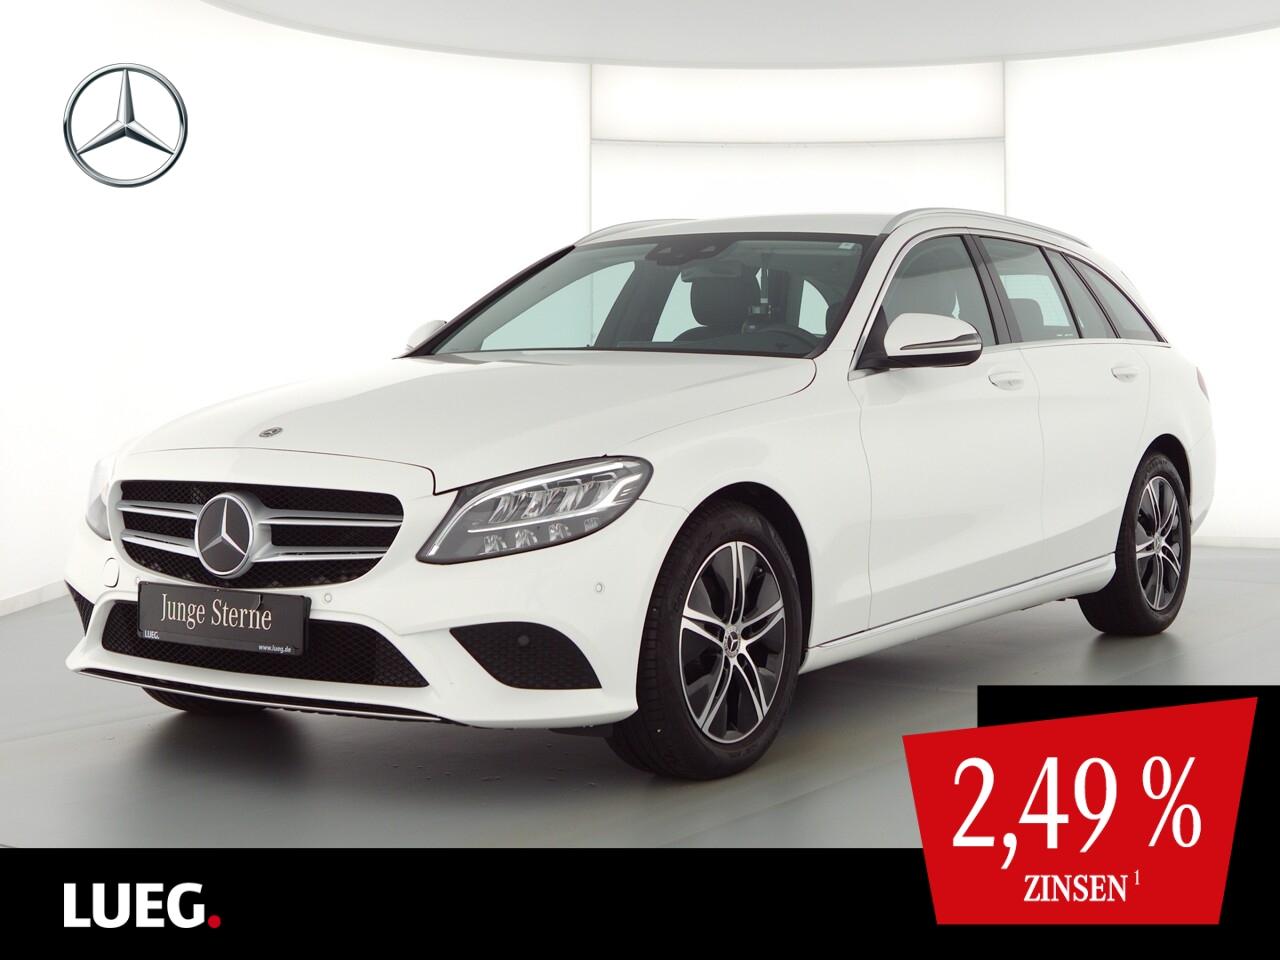 Mercedes-Benz C 180 T Avantgarde+Navi+LED-HP+Sthzg+Burm+Kamera, Jahr 2021, Benzin